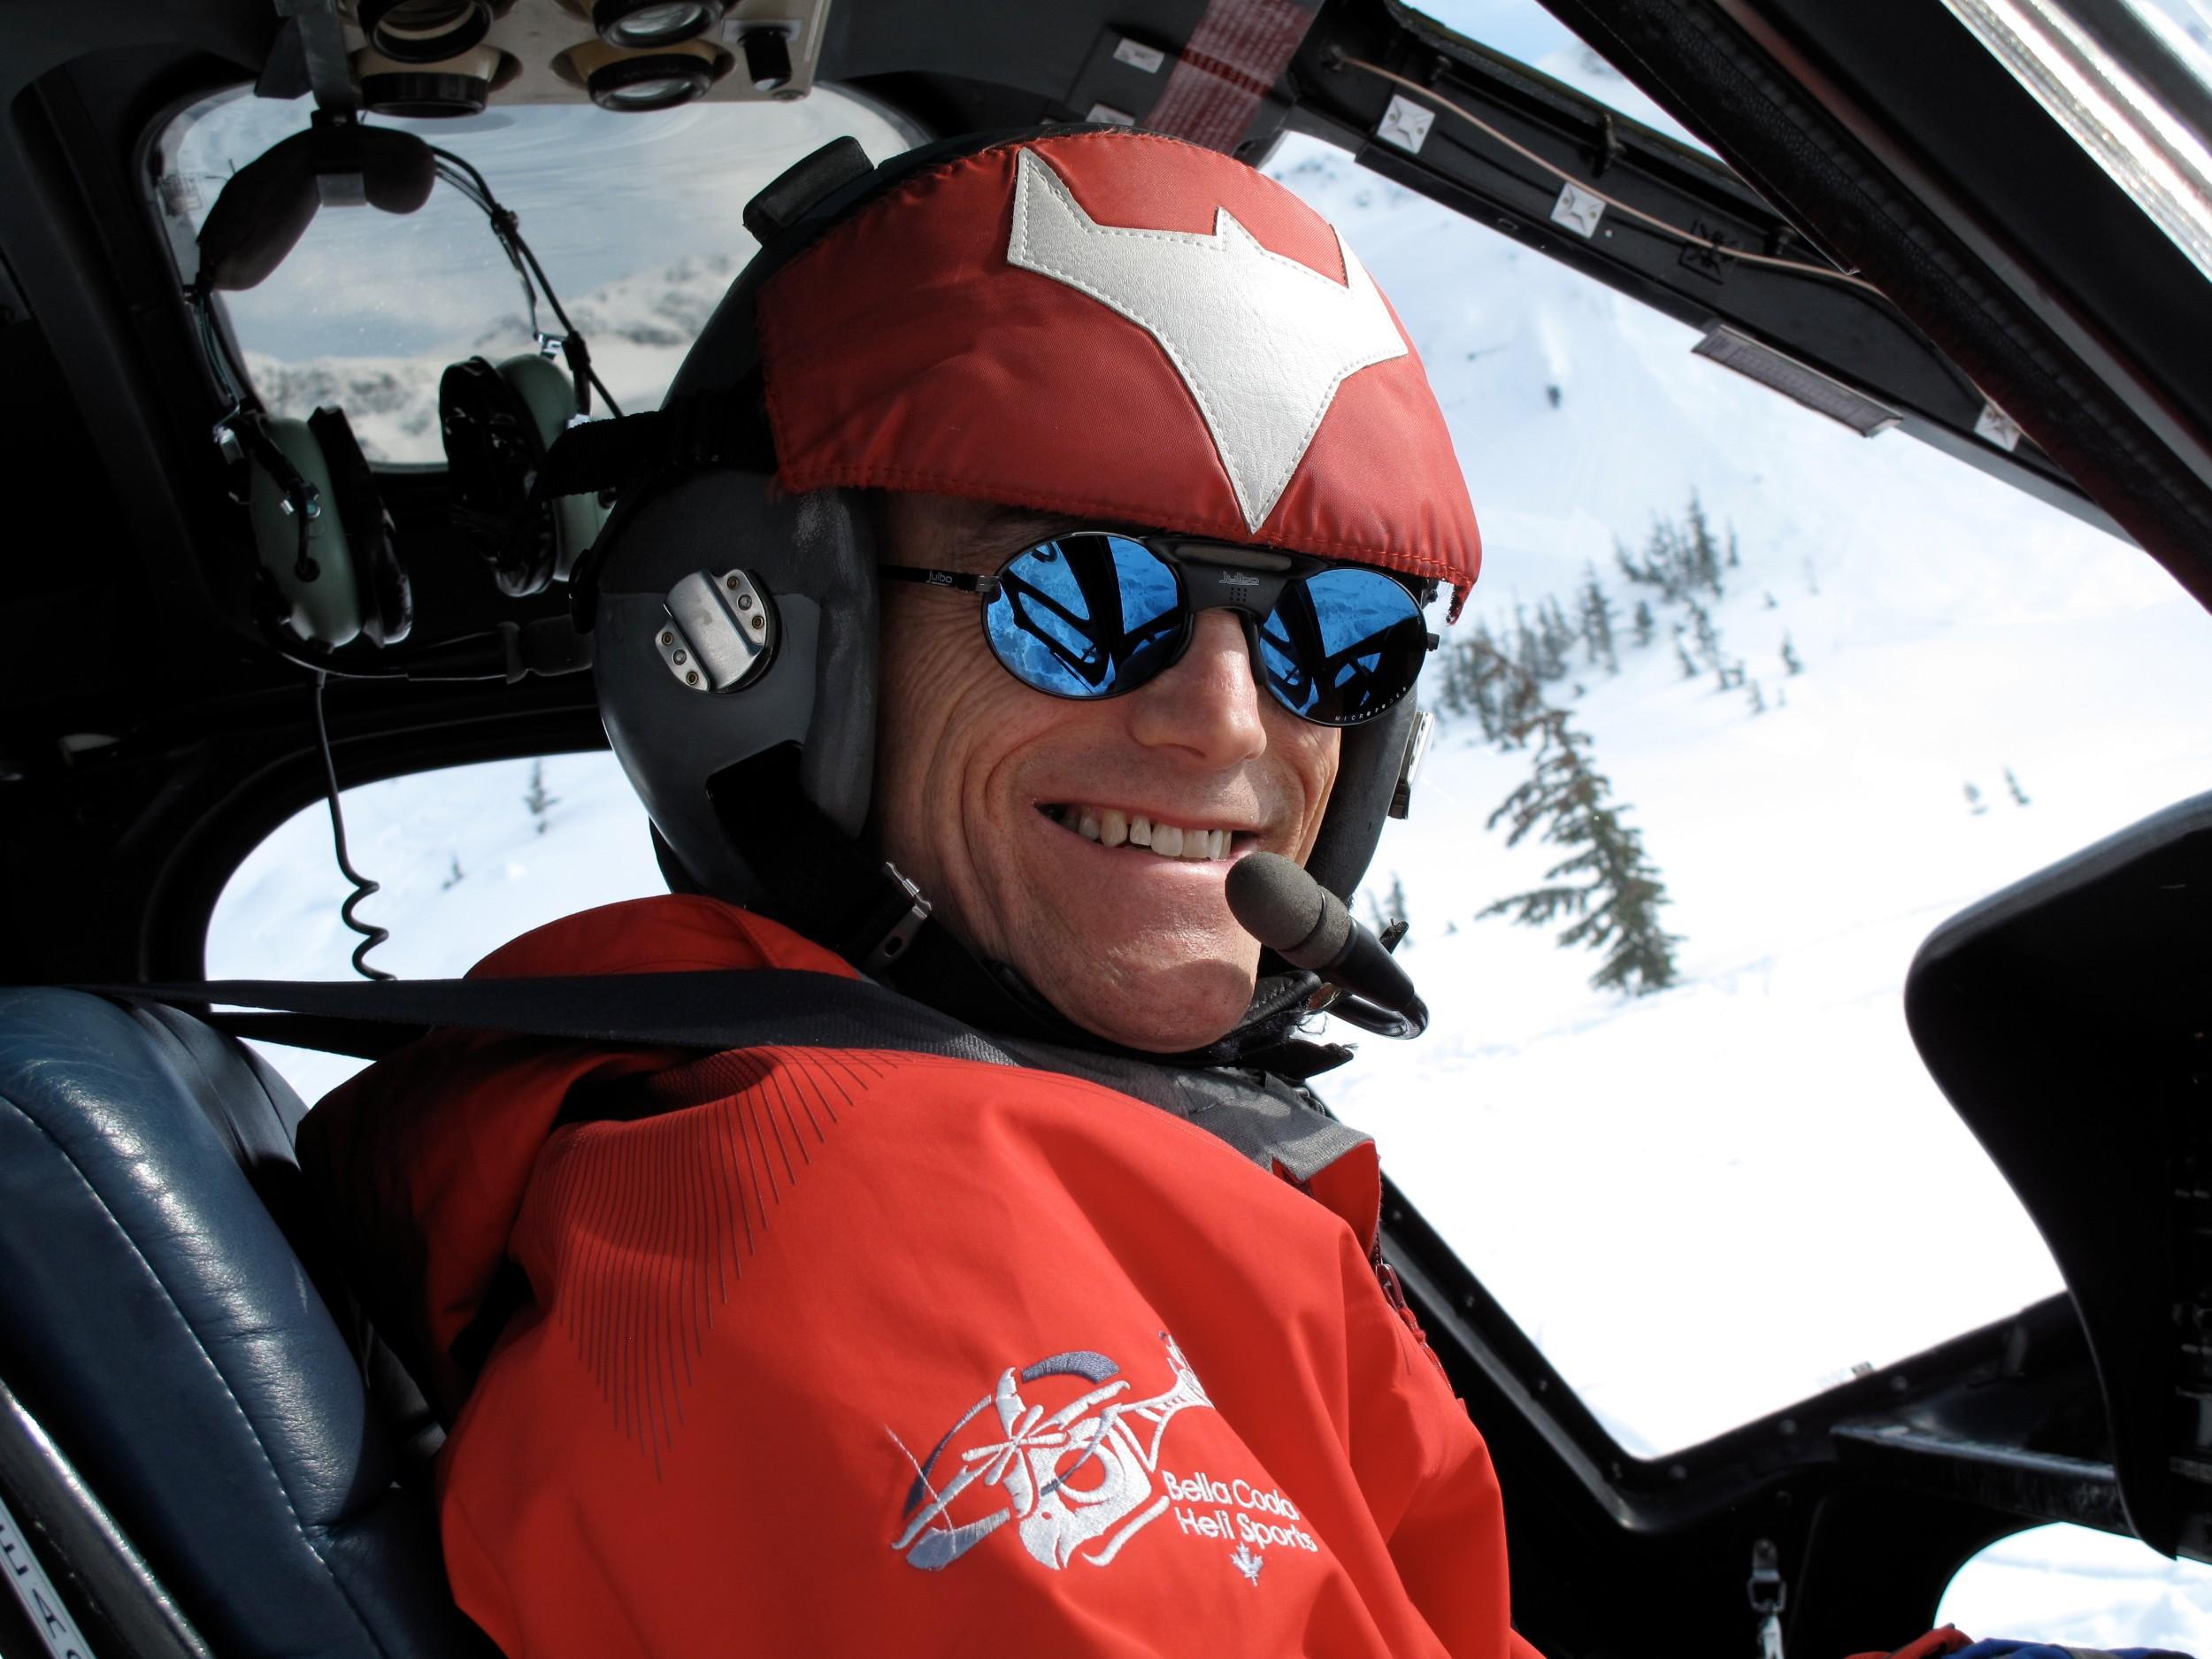 Richard the Pilot photo Bella Coola Heli Sports.jpg.jpg